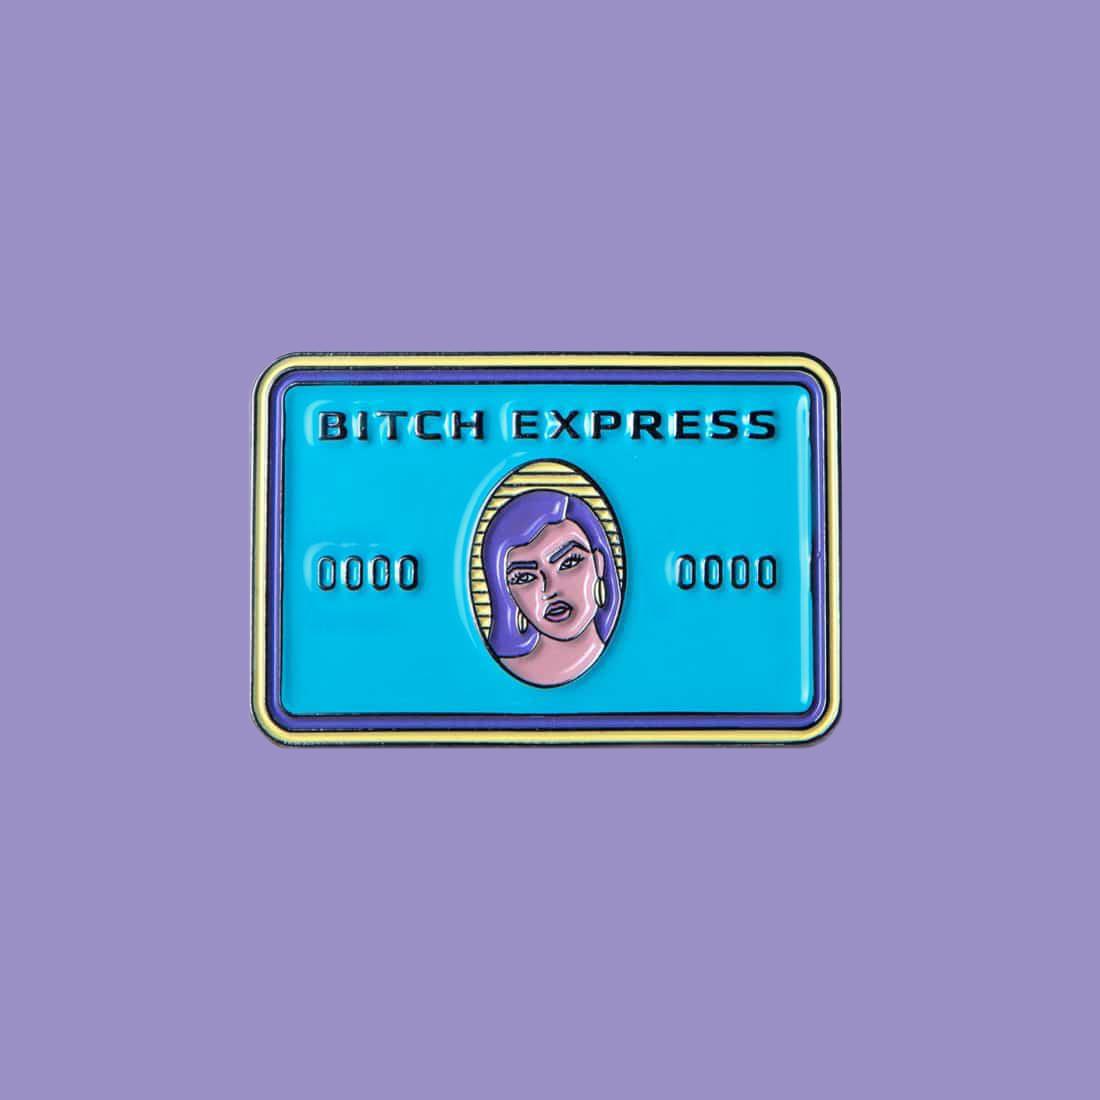 Bitch Express Pin by La Come Di